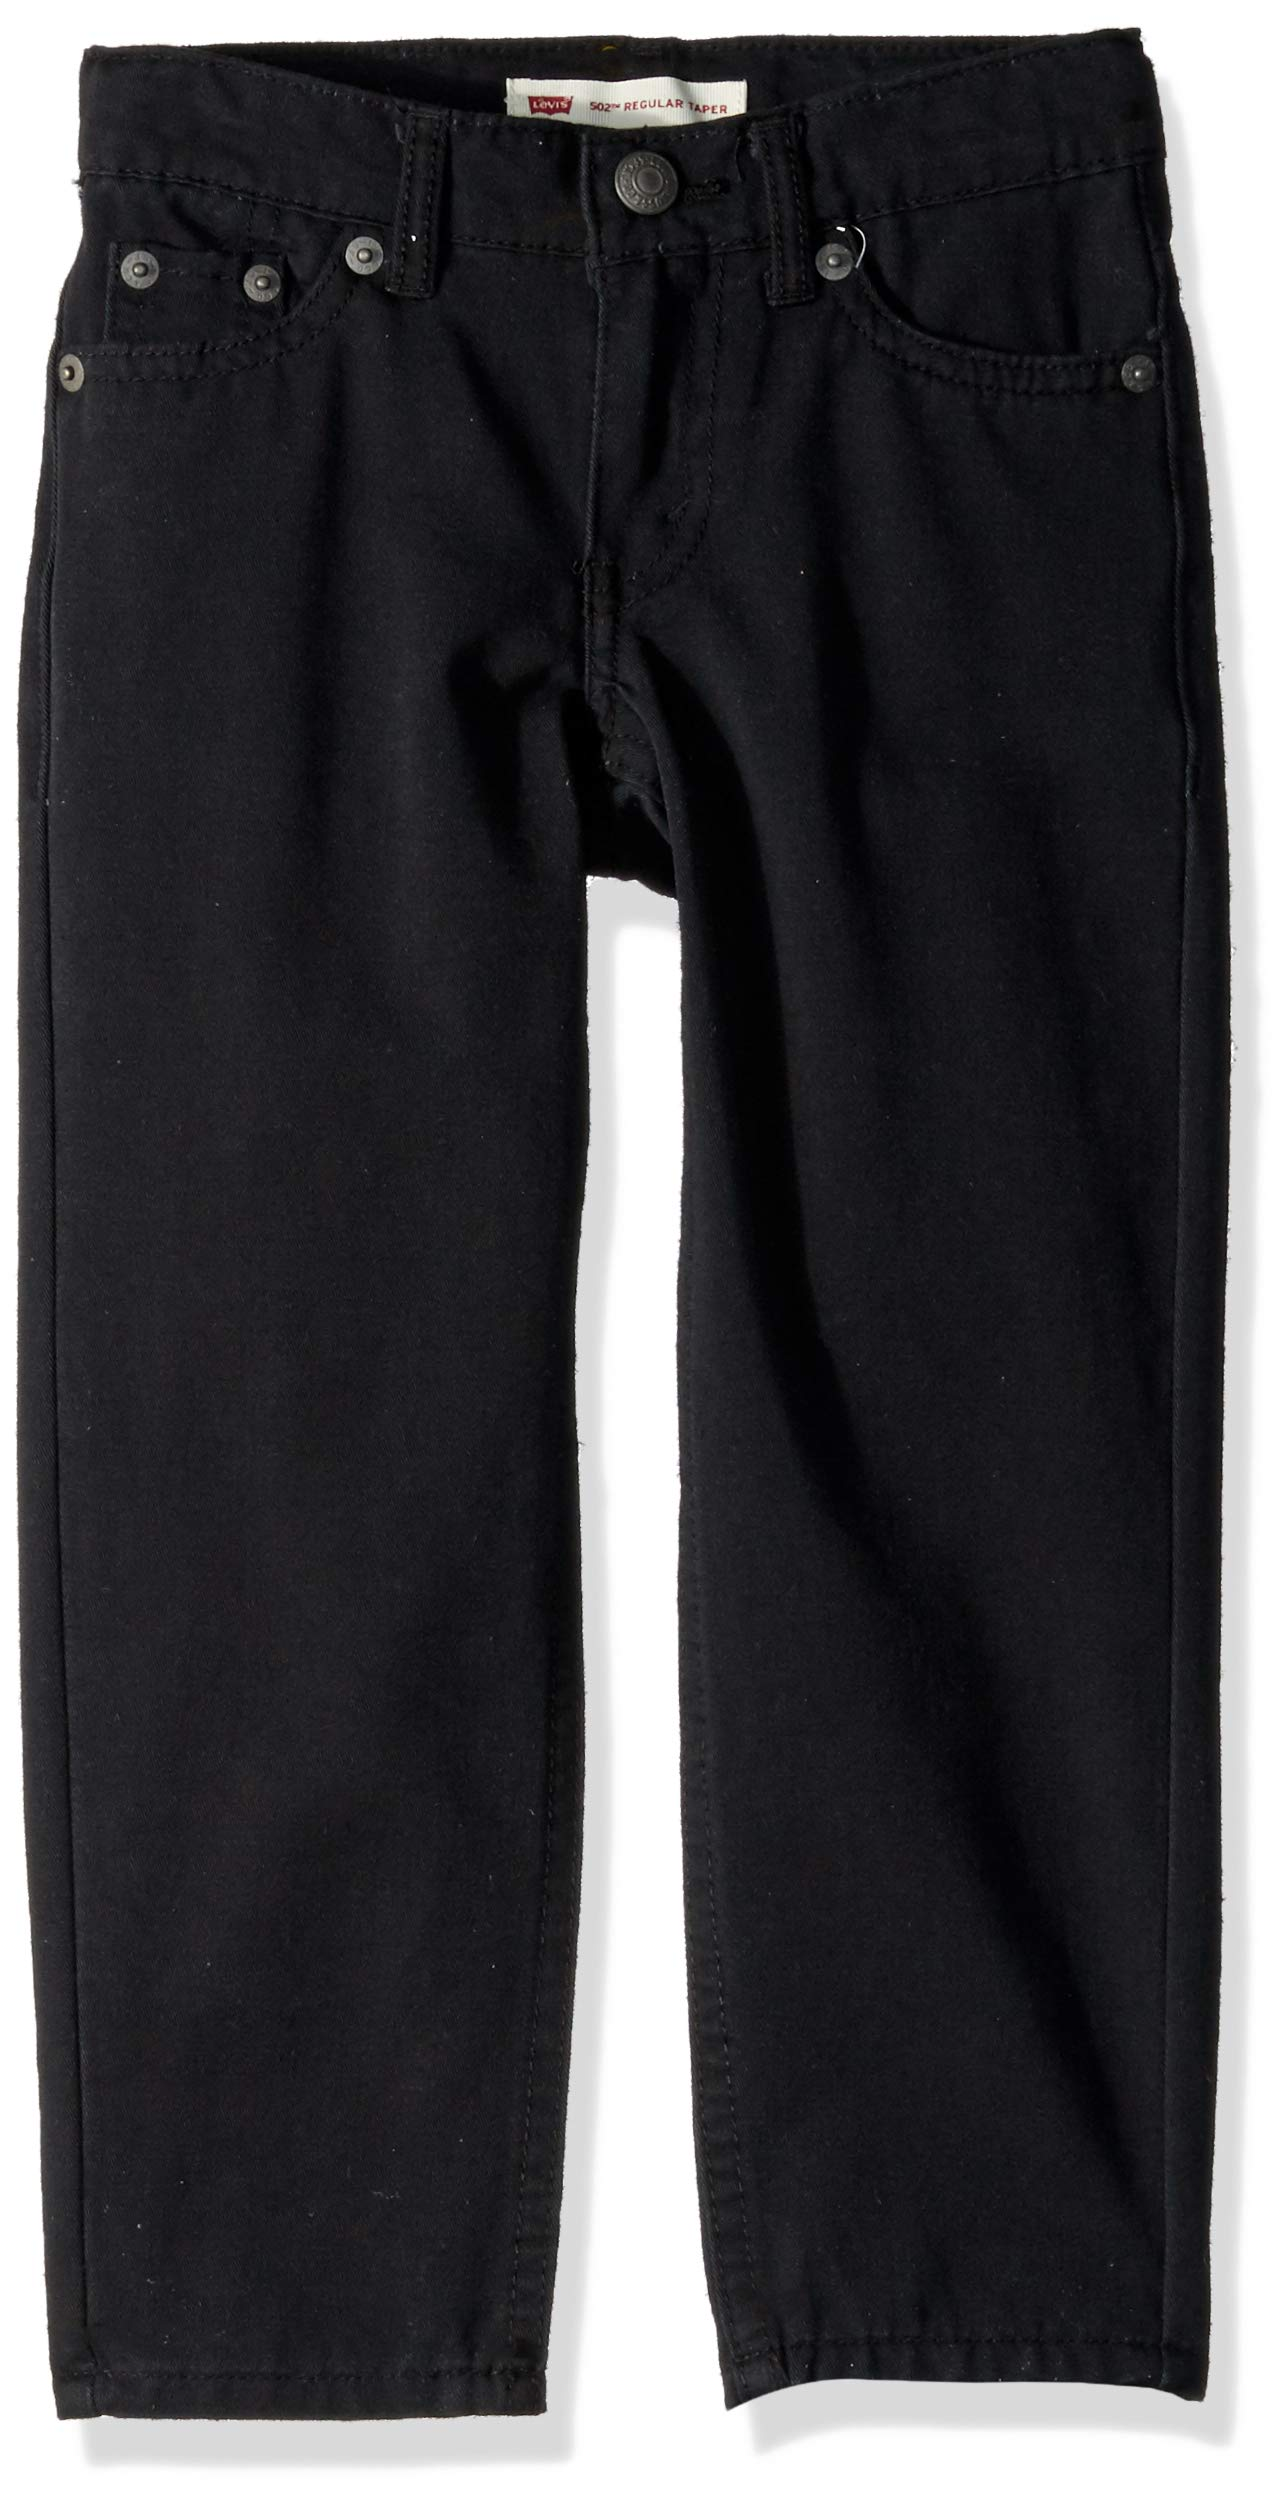 Levi's Boys' Big 502 Regular Fit Taper Jeans, Black Stretch, 20 by Levi's